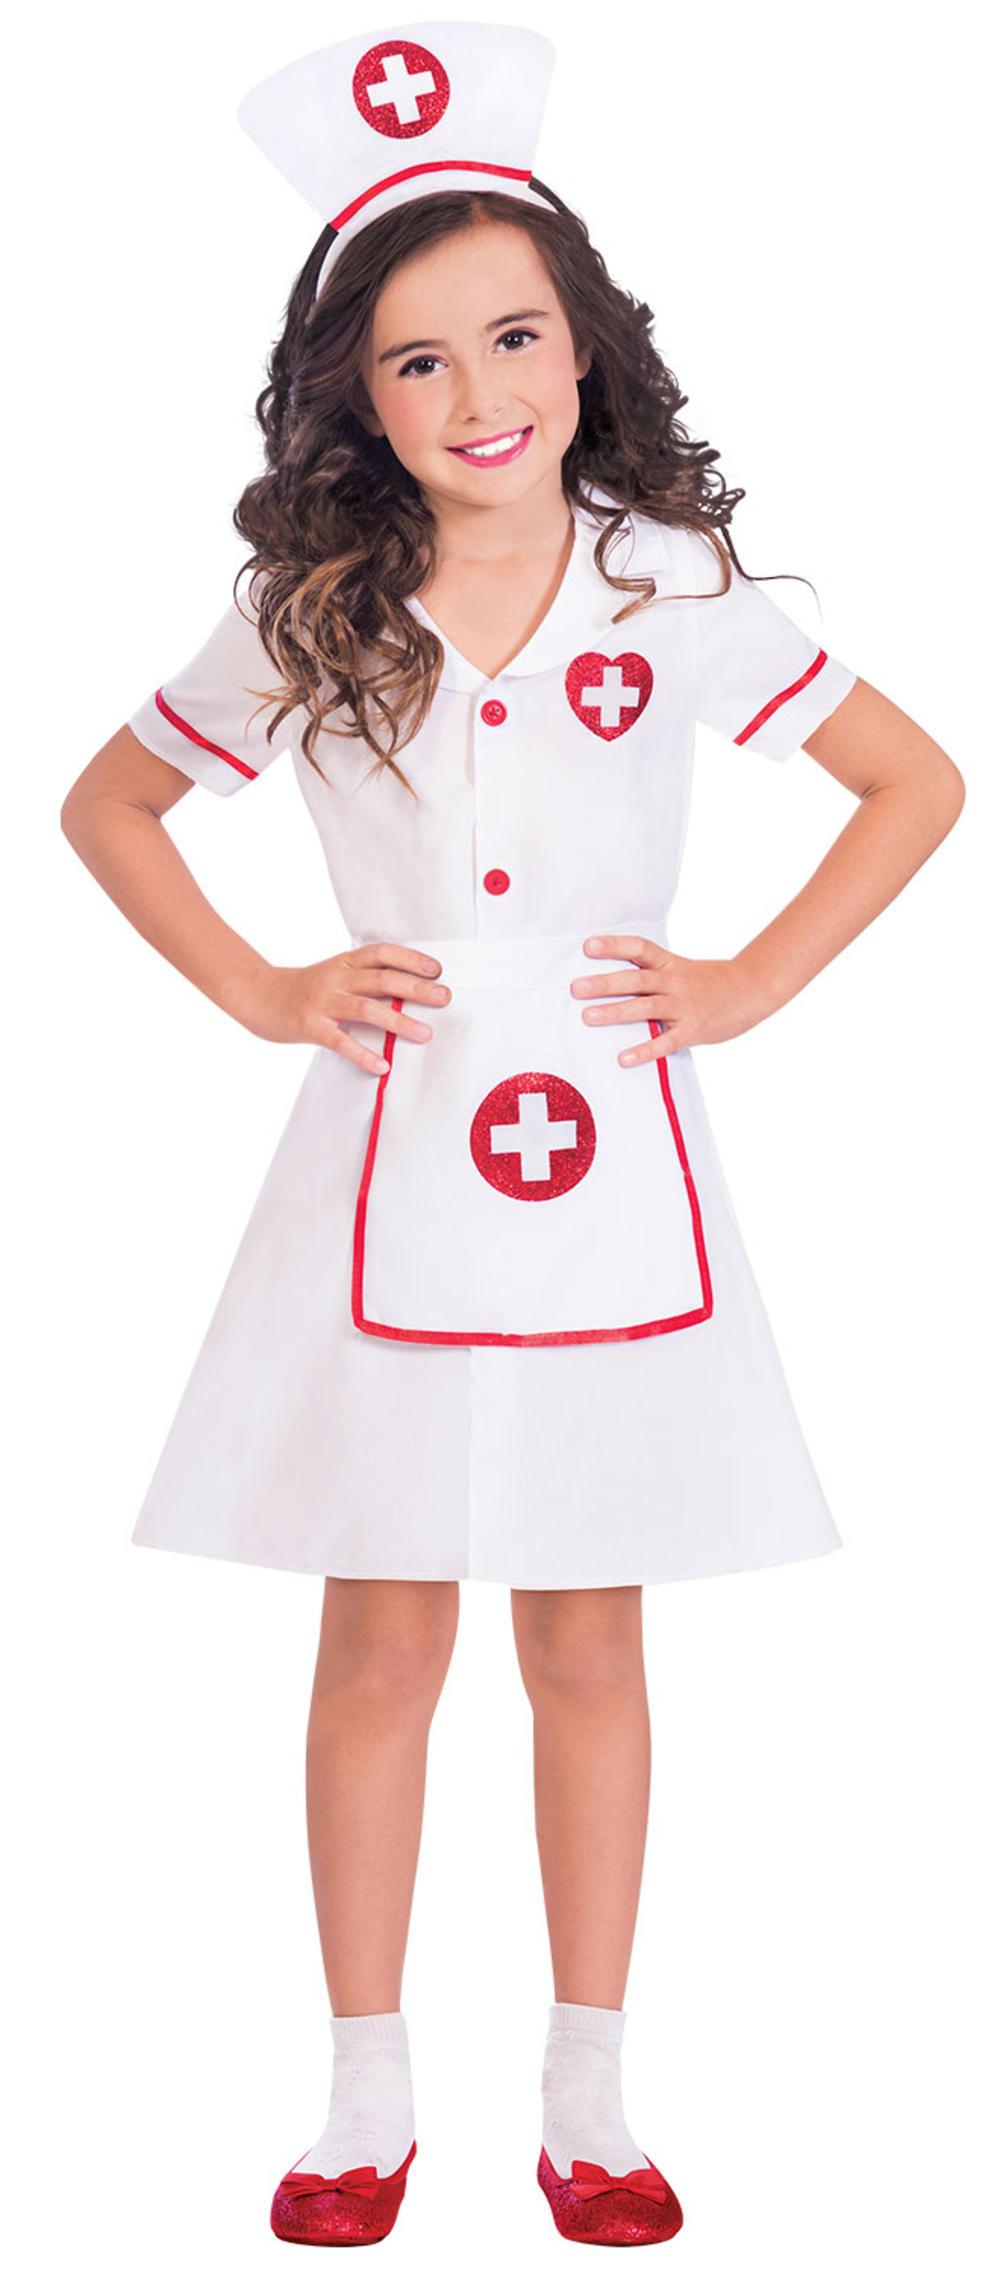 Darling Nurse Girls Costume